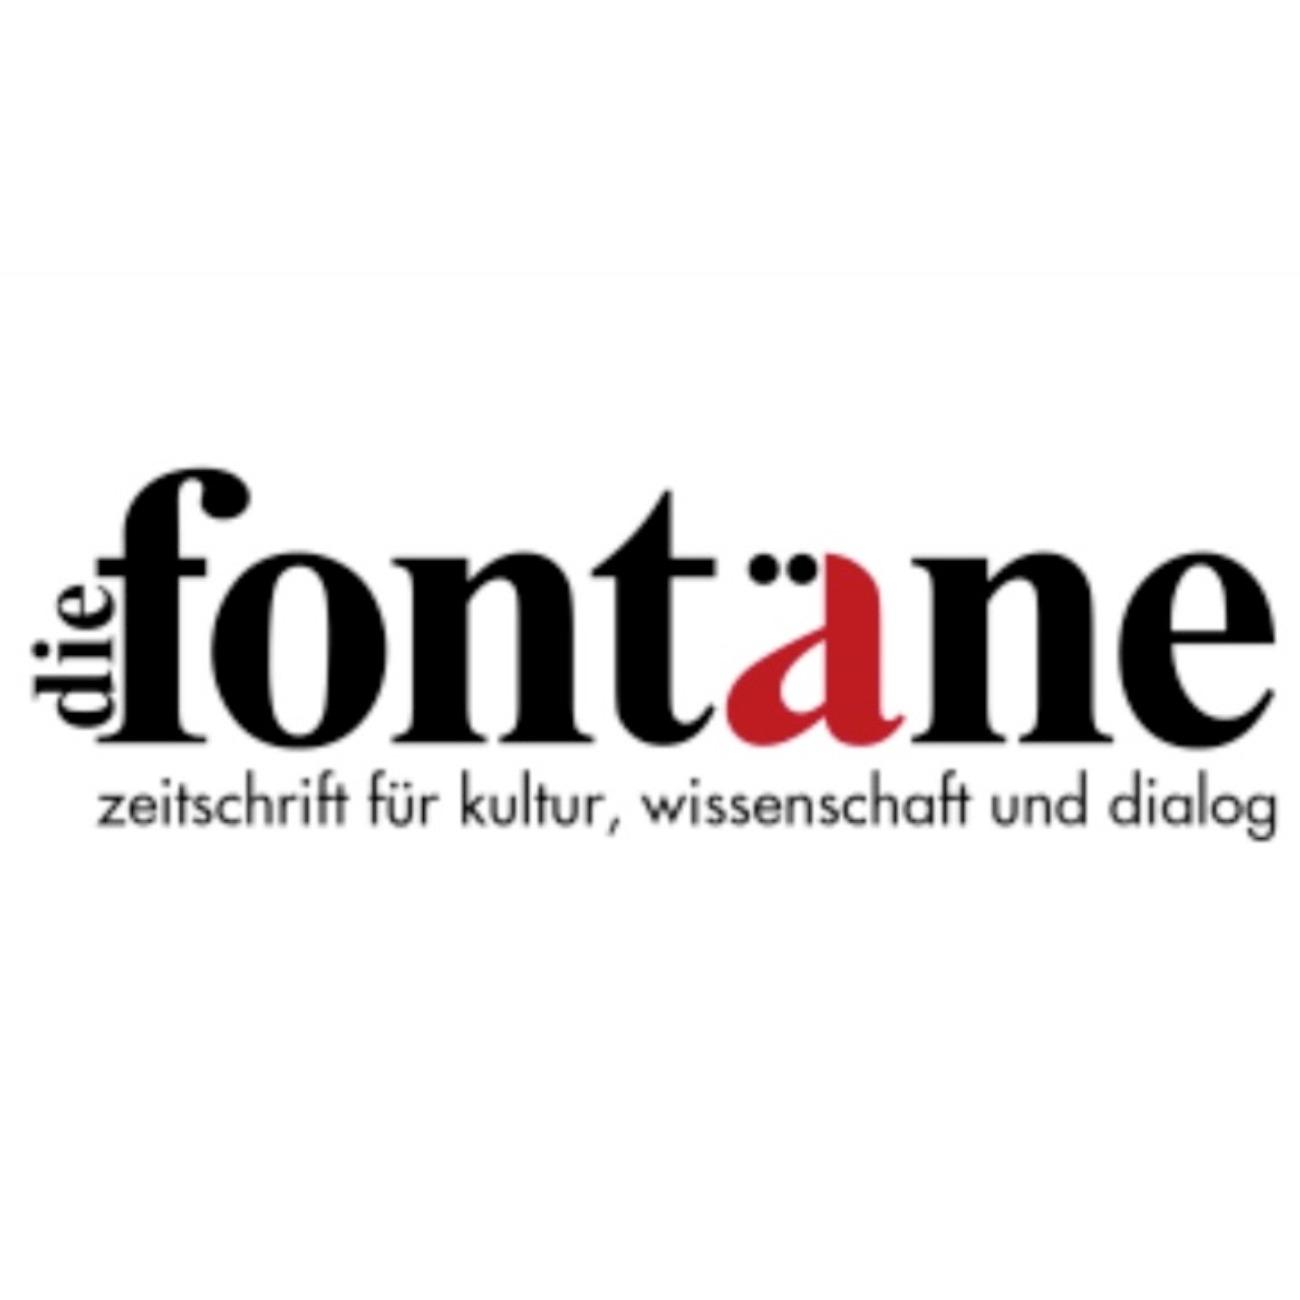 fontaene logo